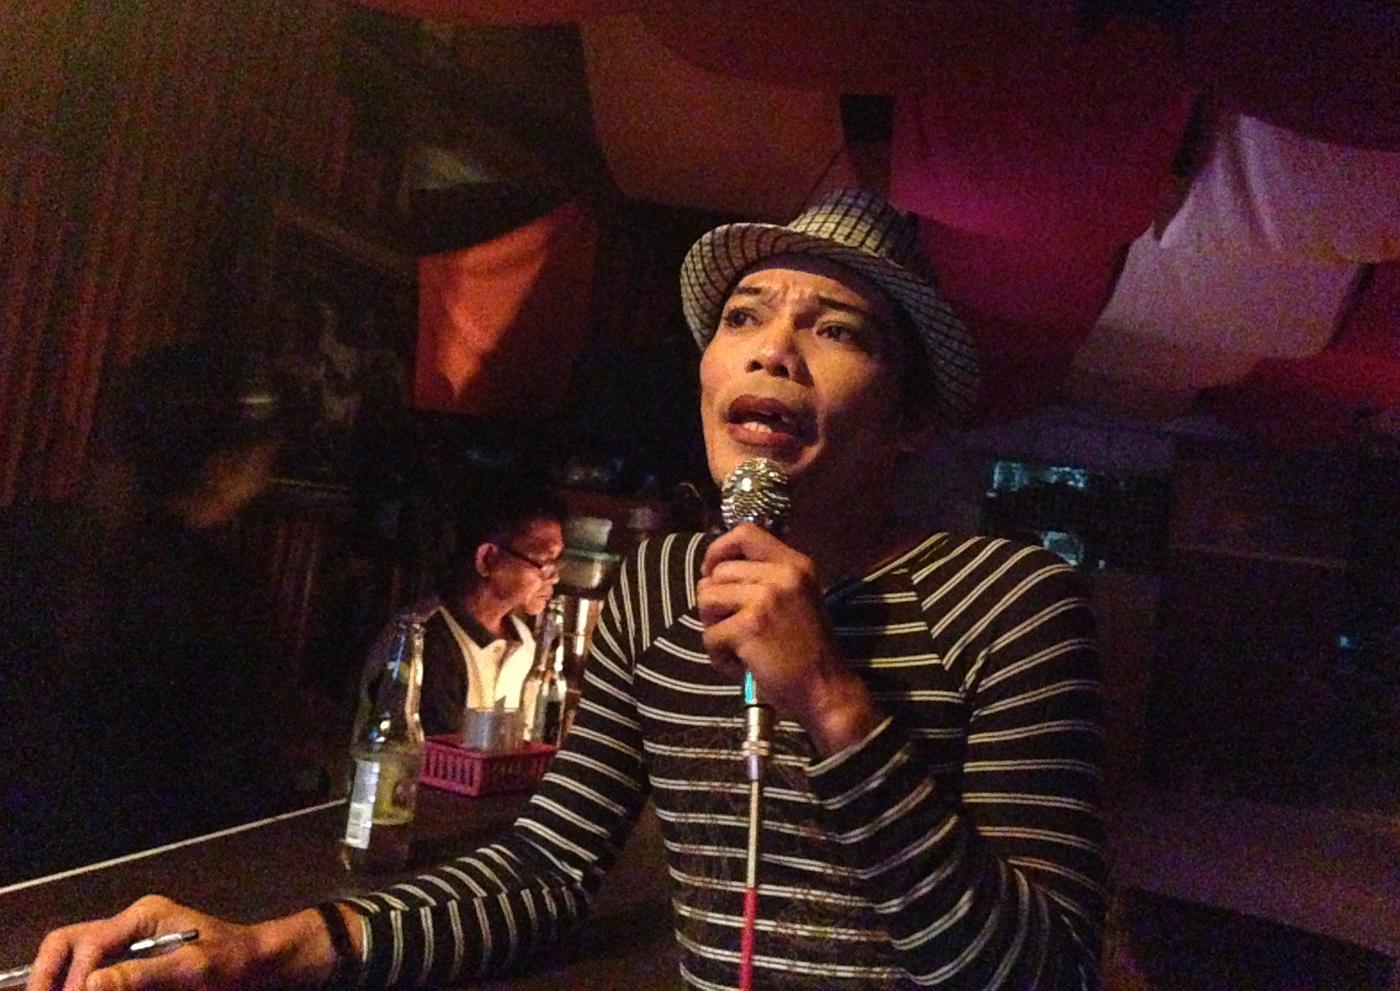 Syngende vertskap på bar i Barretto:)